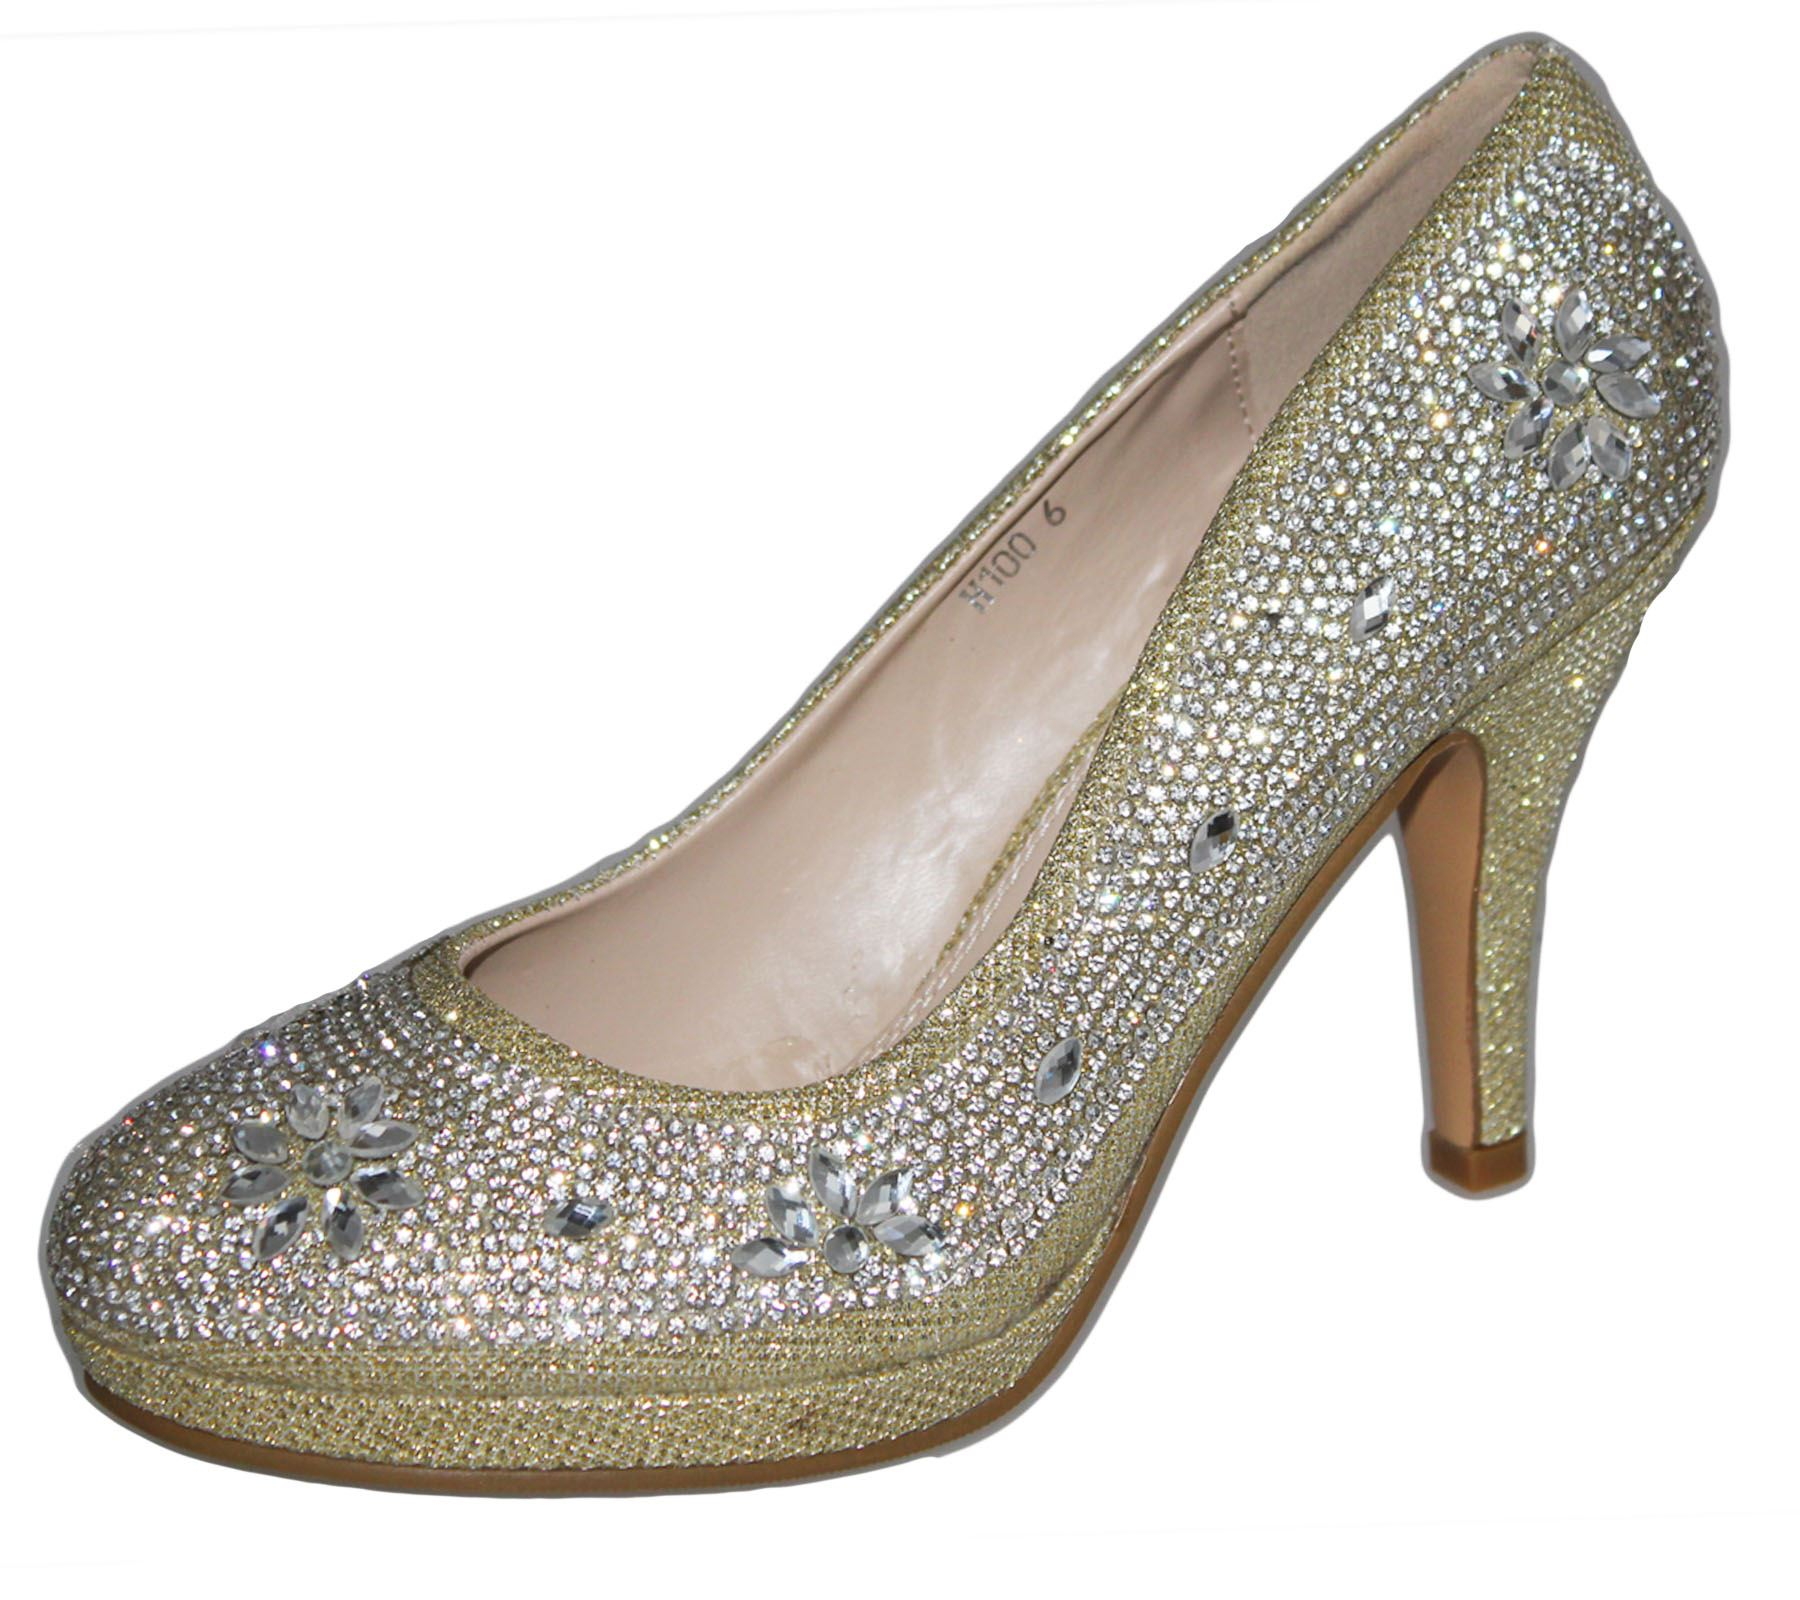 Womens-Platforms-High-Heels-Wedding-Bridal-Evening-Diamante-Ladies-Party-Shoes miniatura 18